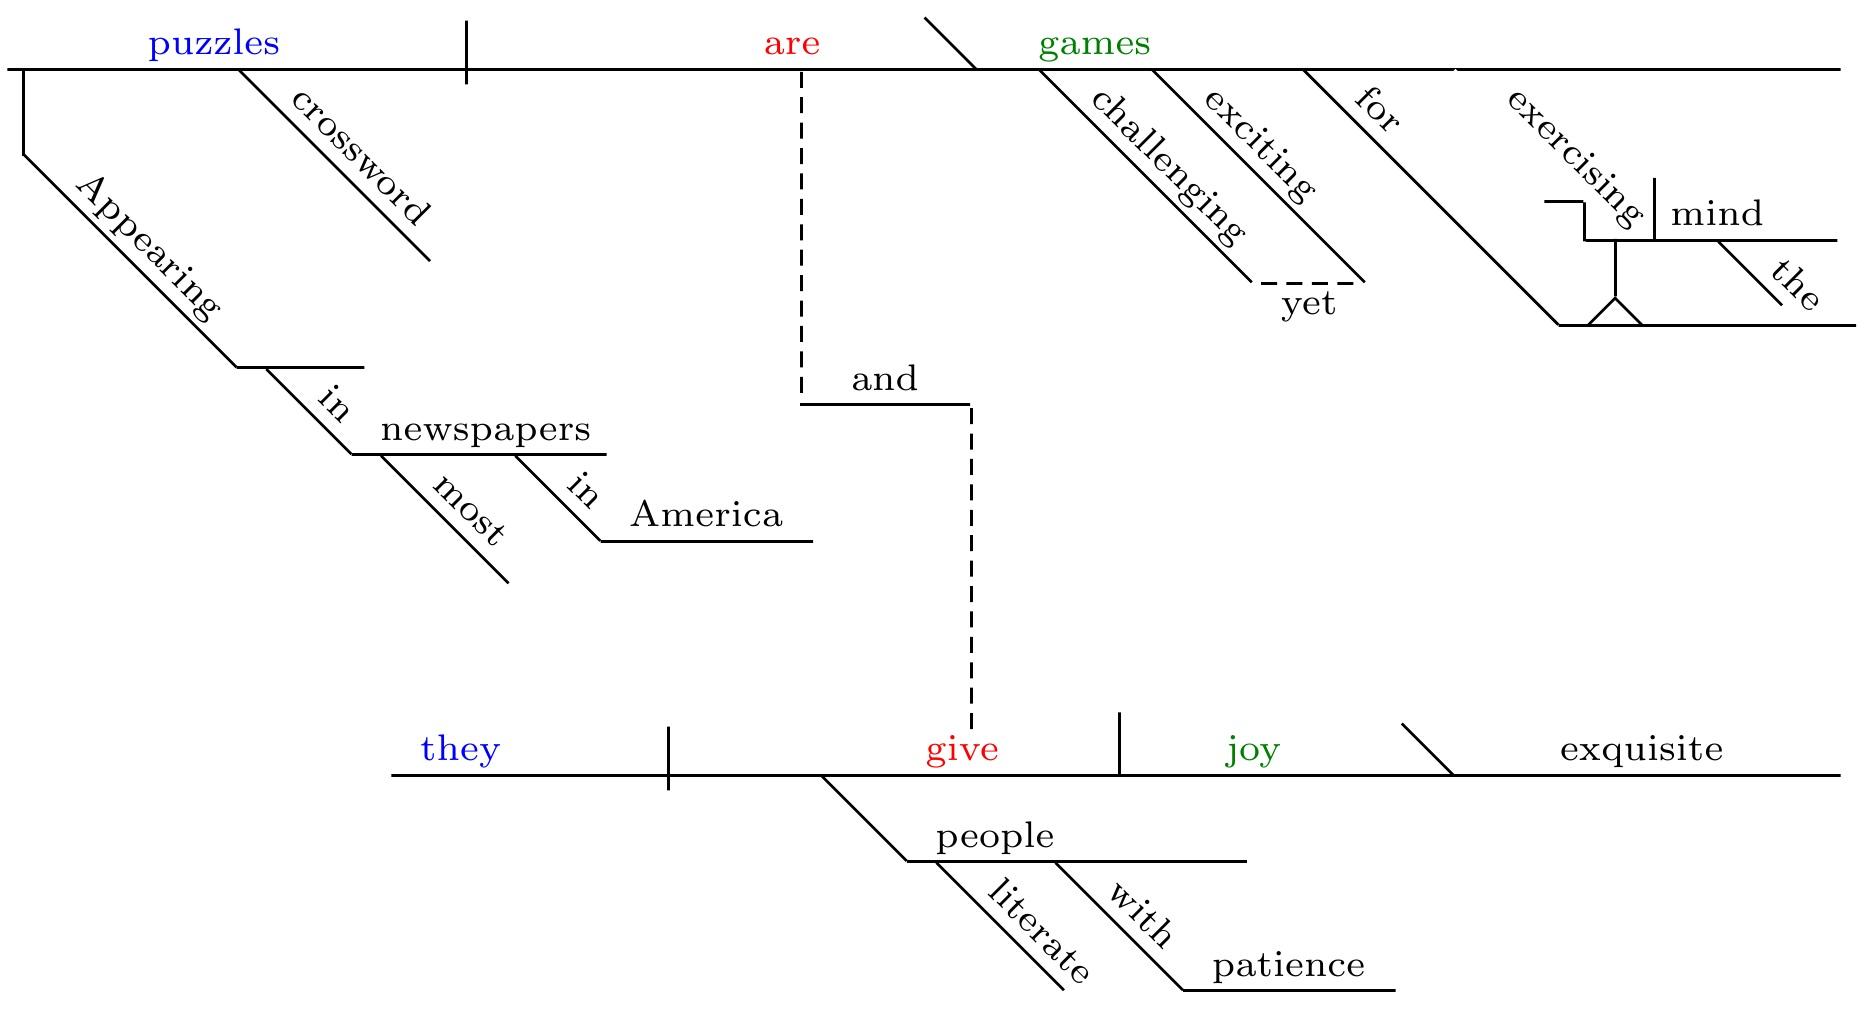 how to diagram a complex sentence tao 110 atv wiring diagramming compound sentences